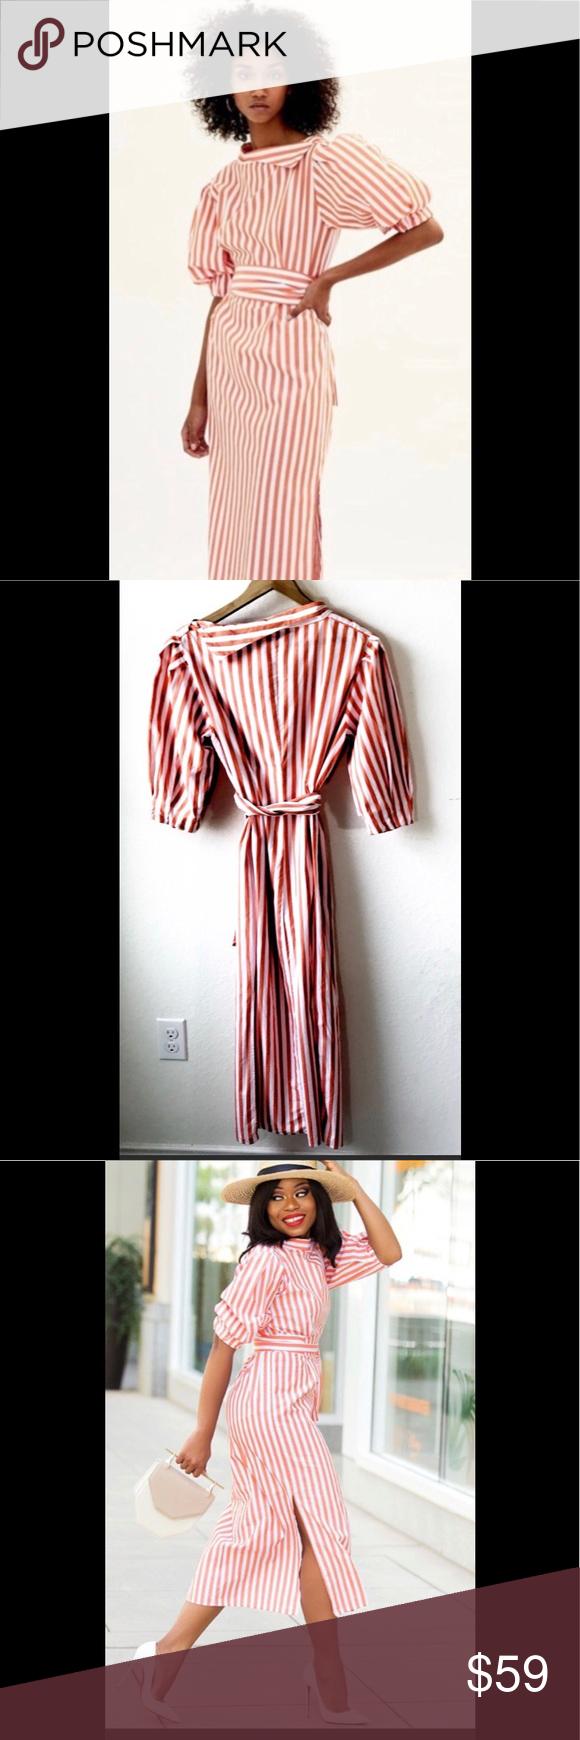 "dc10807e NWT Zara ""creamsicle midi dress NWT midi dress from Zara Size XS Orange and  white"